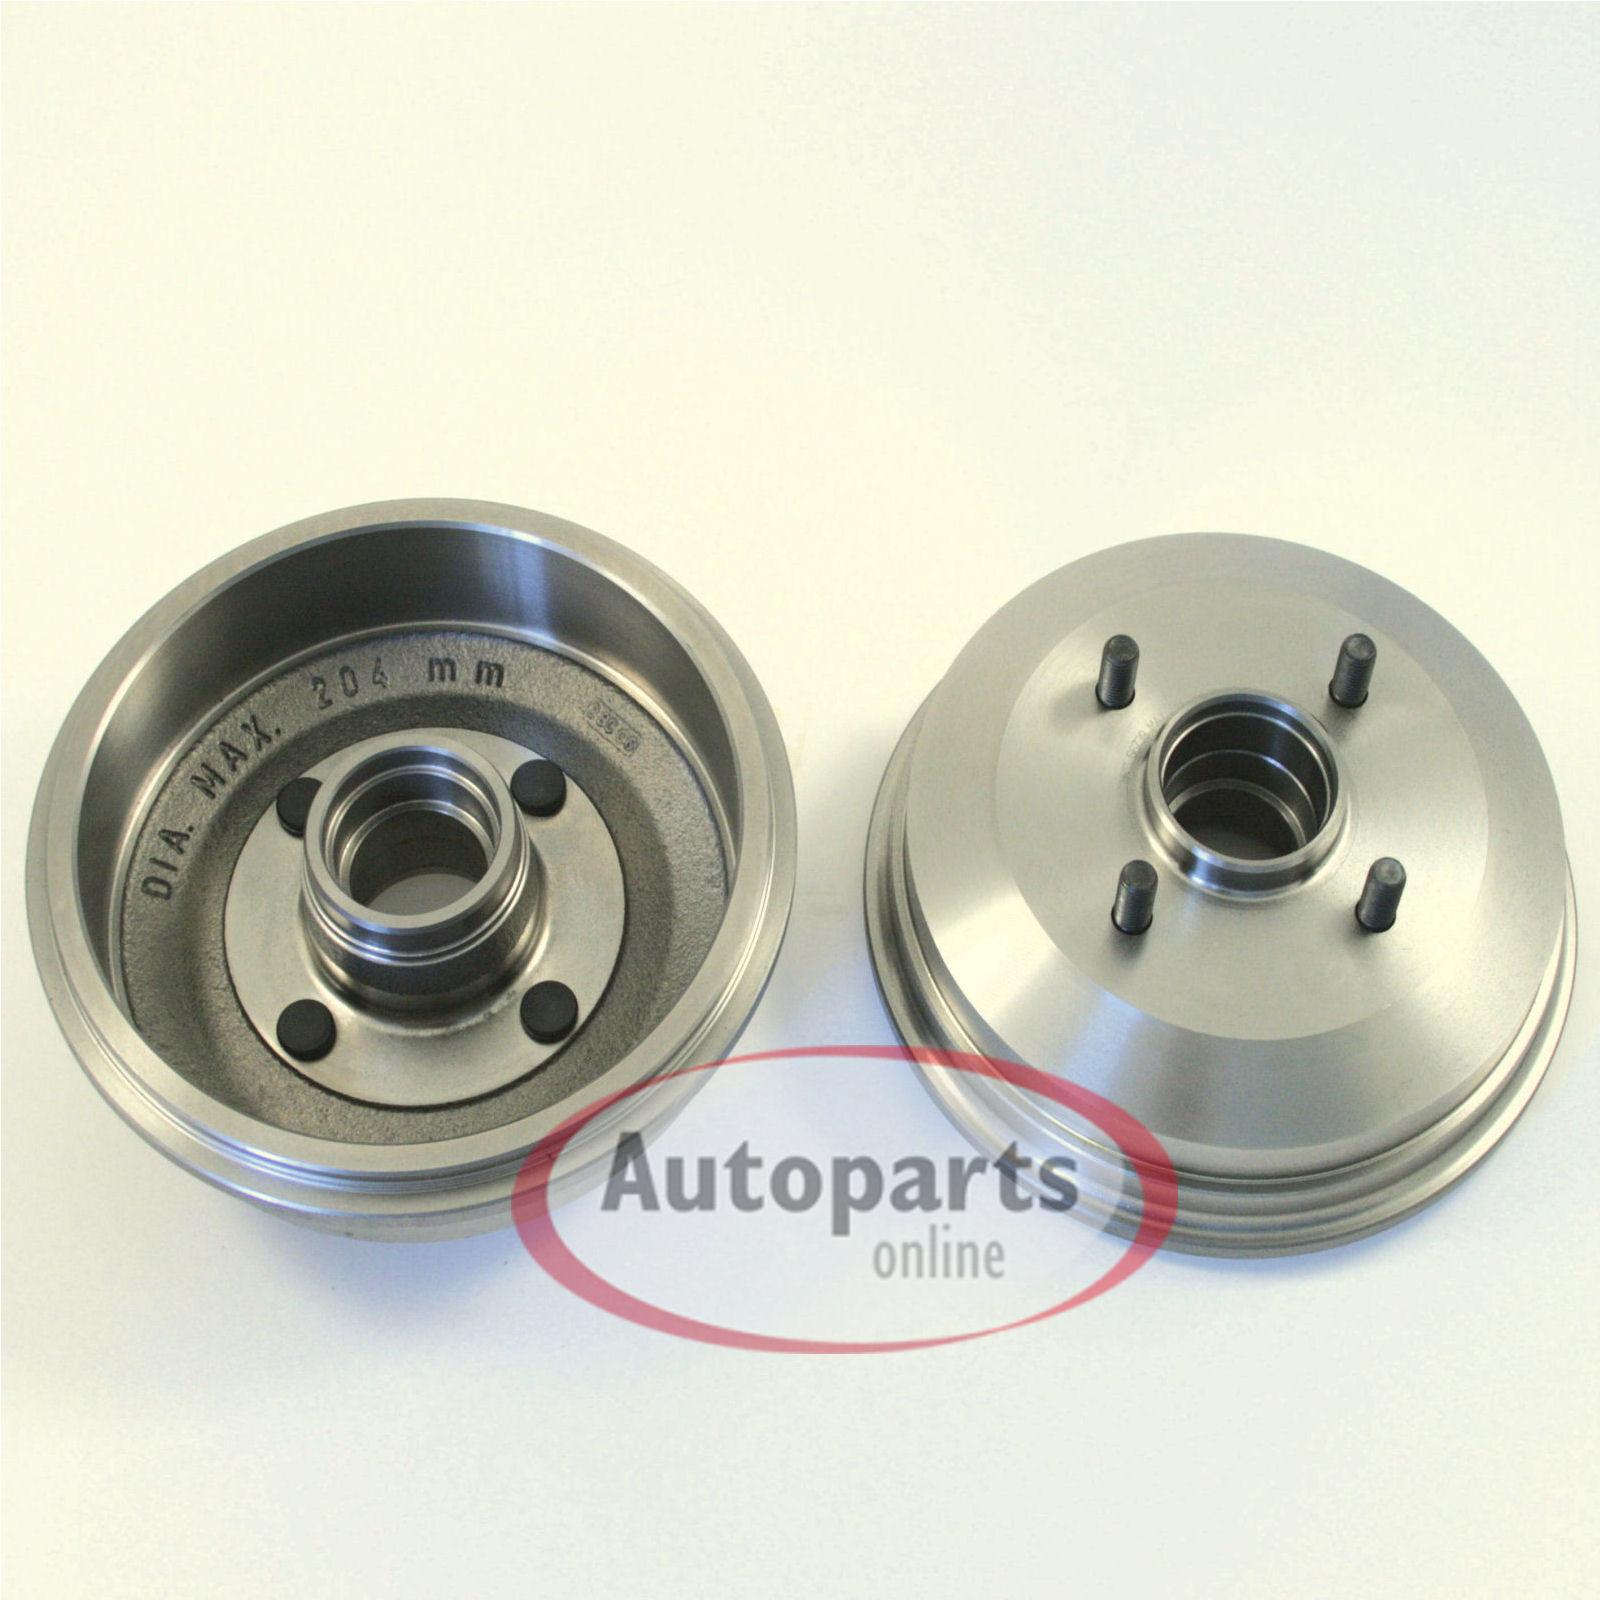 Si adatta FIAT MULTIPLA 186 1.9 Multijet 115 ORIGINALI APEC cilindro freno ruota posteriore